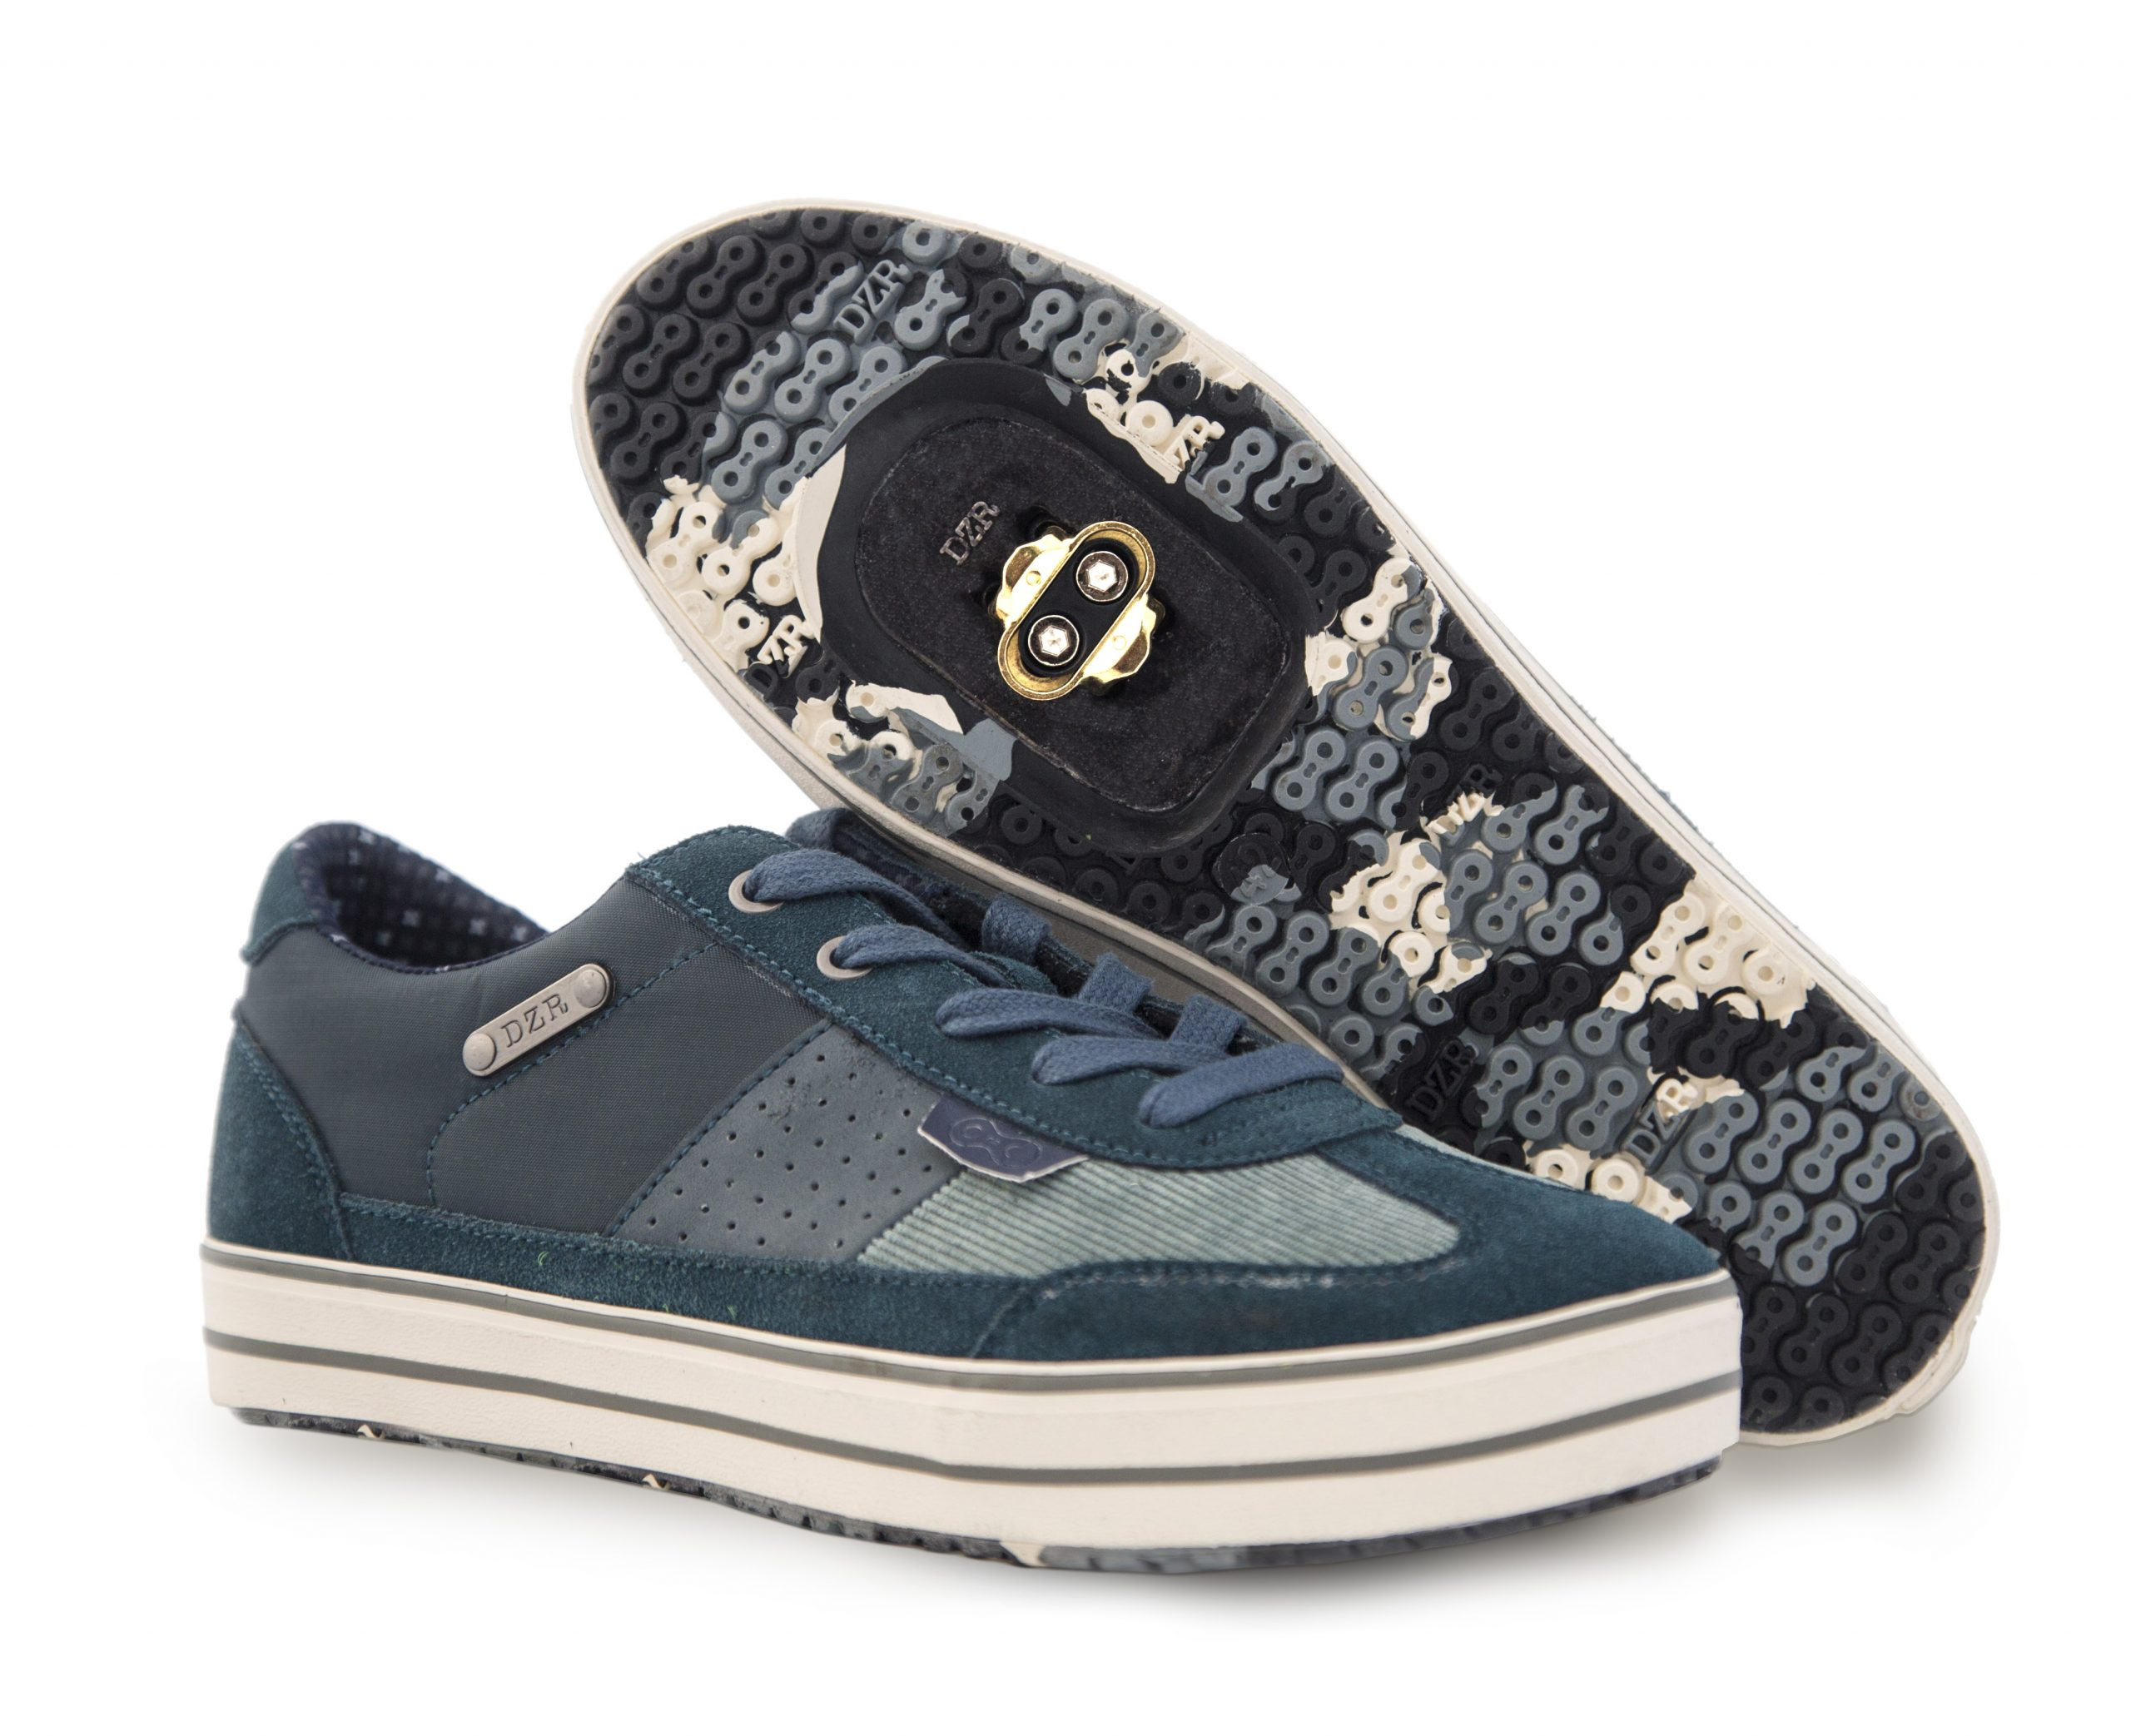 , DZR Releases New Shoes – Minna Cadet & Minna Mist